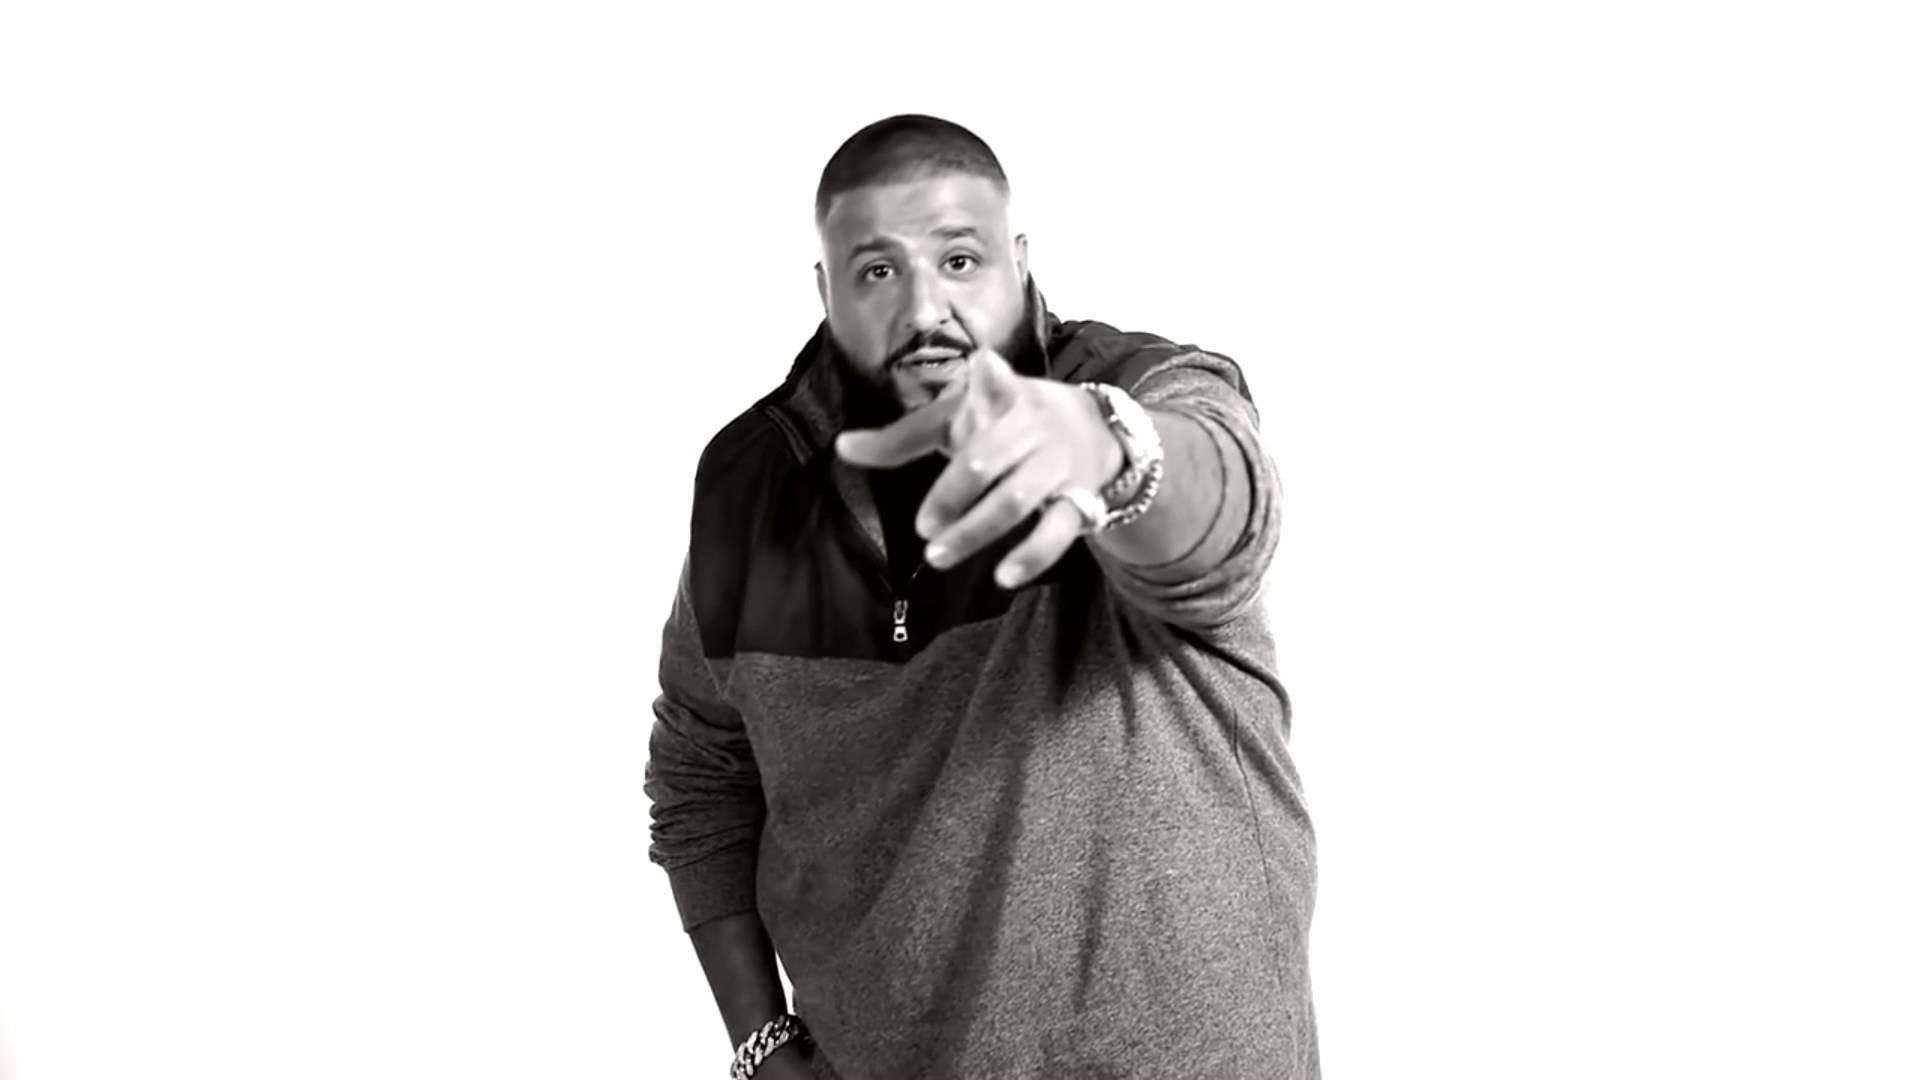 Dj Khaled High Definition